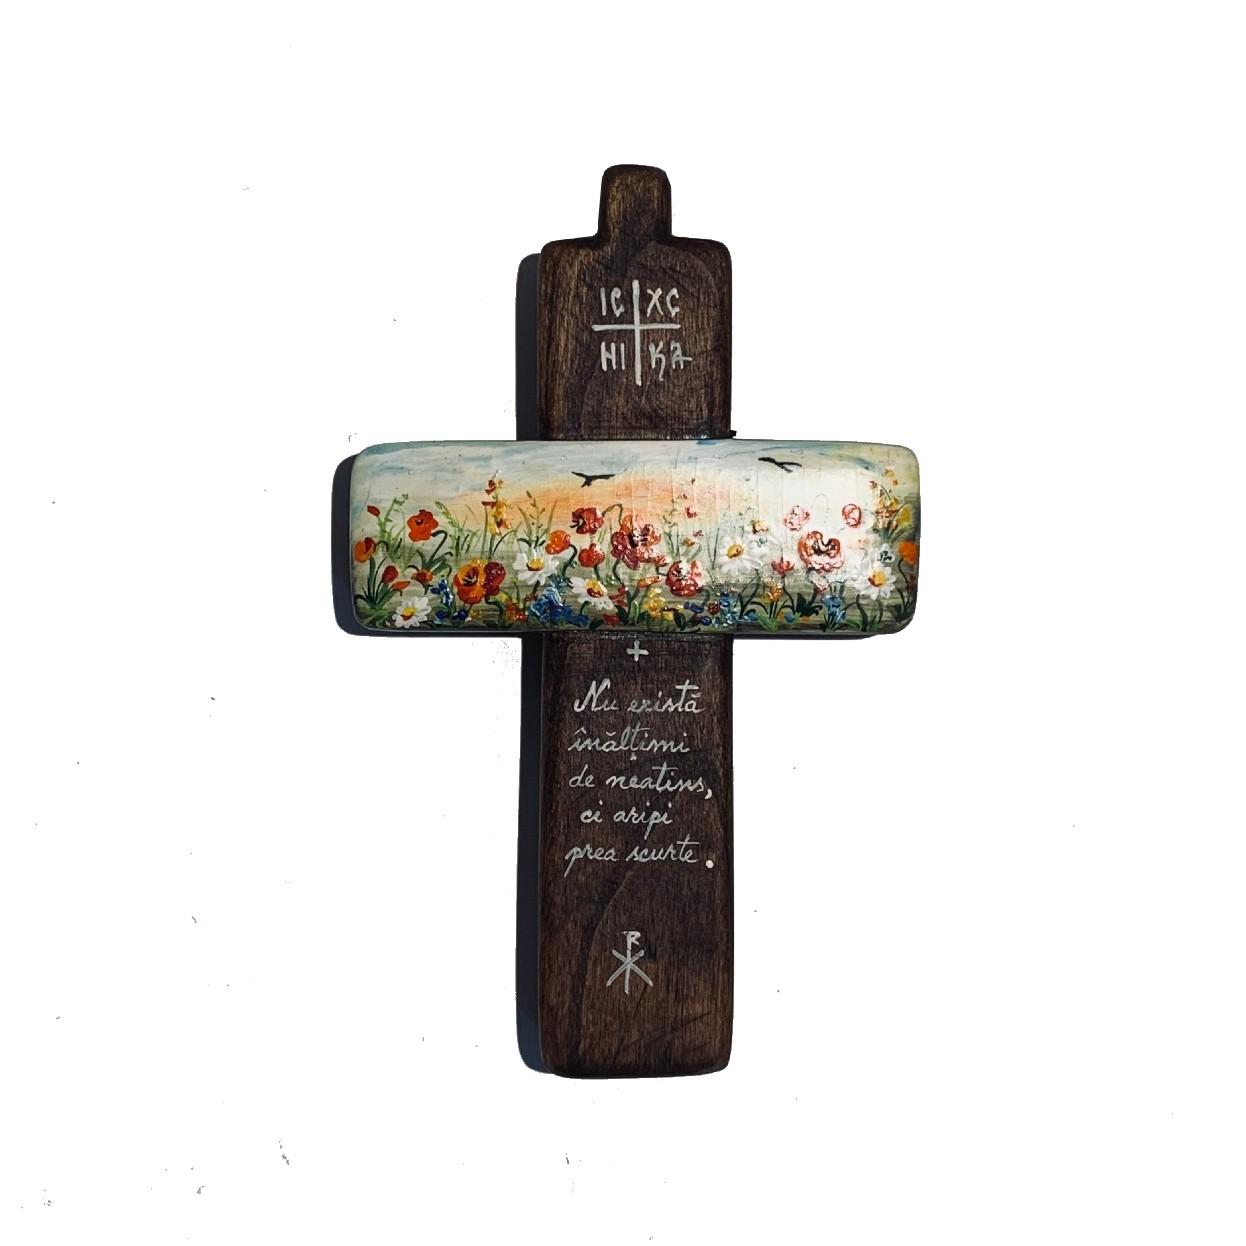 Cruce din lemn de nuc 5_wood cross_icon_hand made_traditional_RafGallery_romanian_art_VR_gallery_shop_360